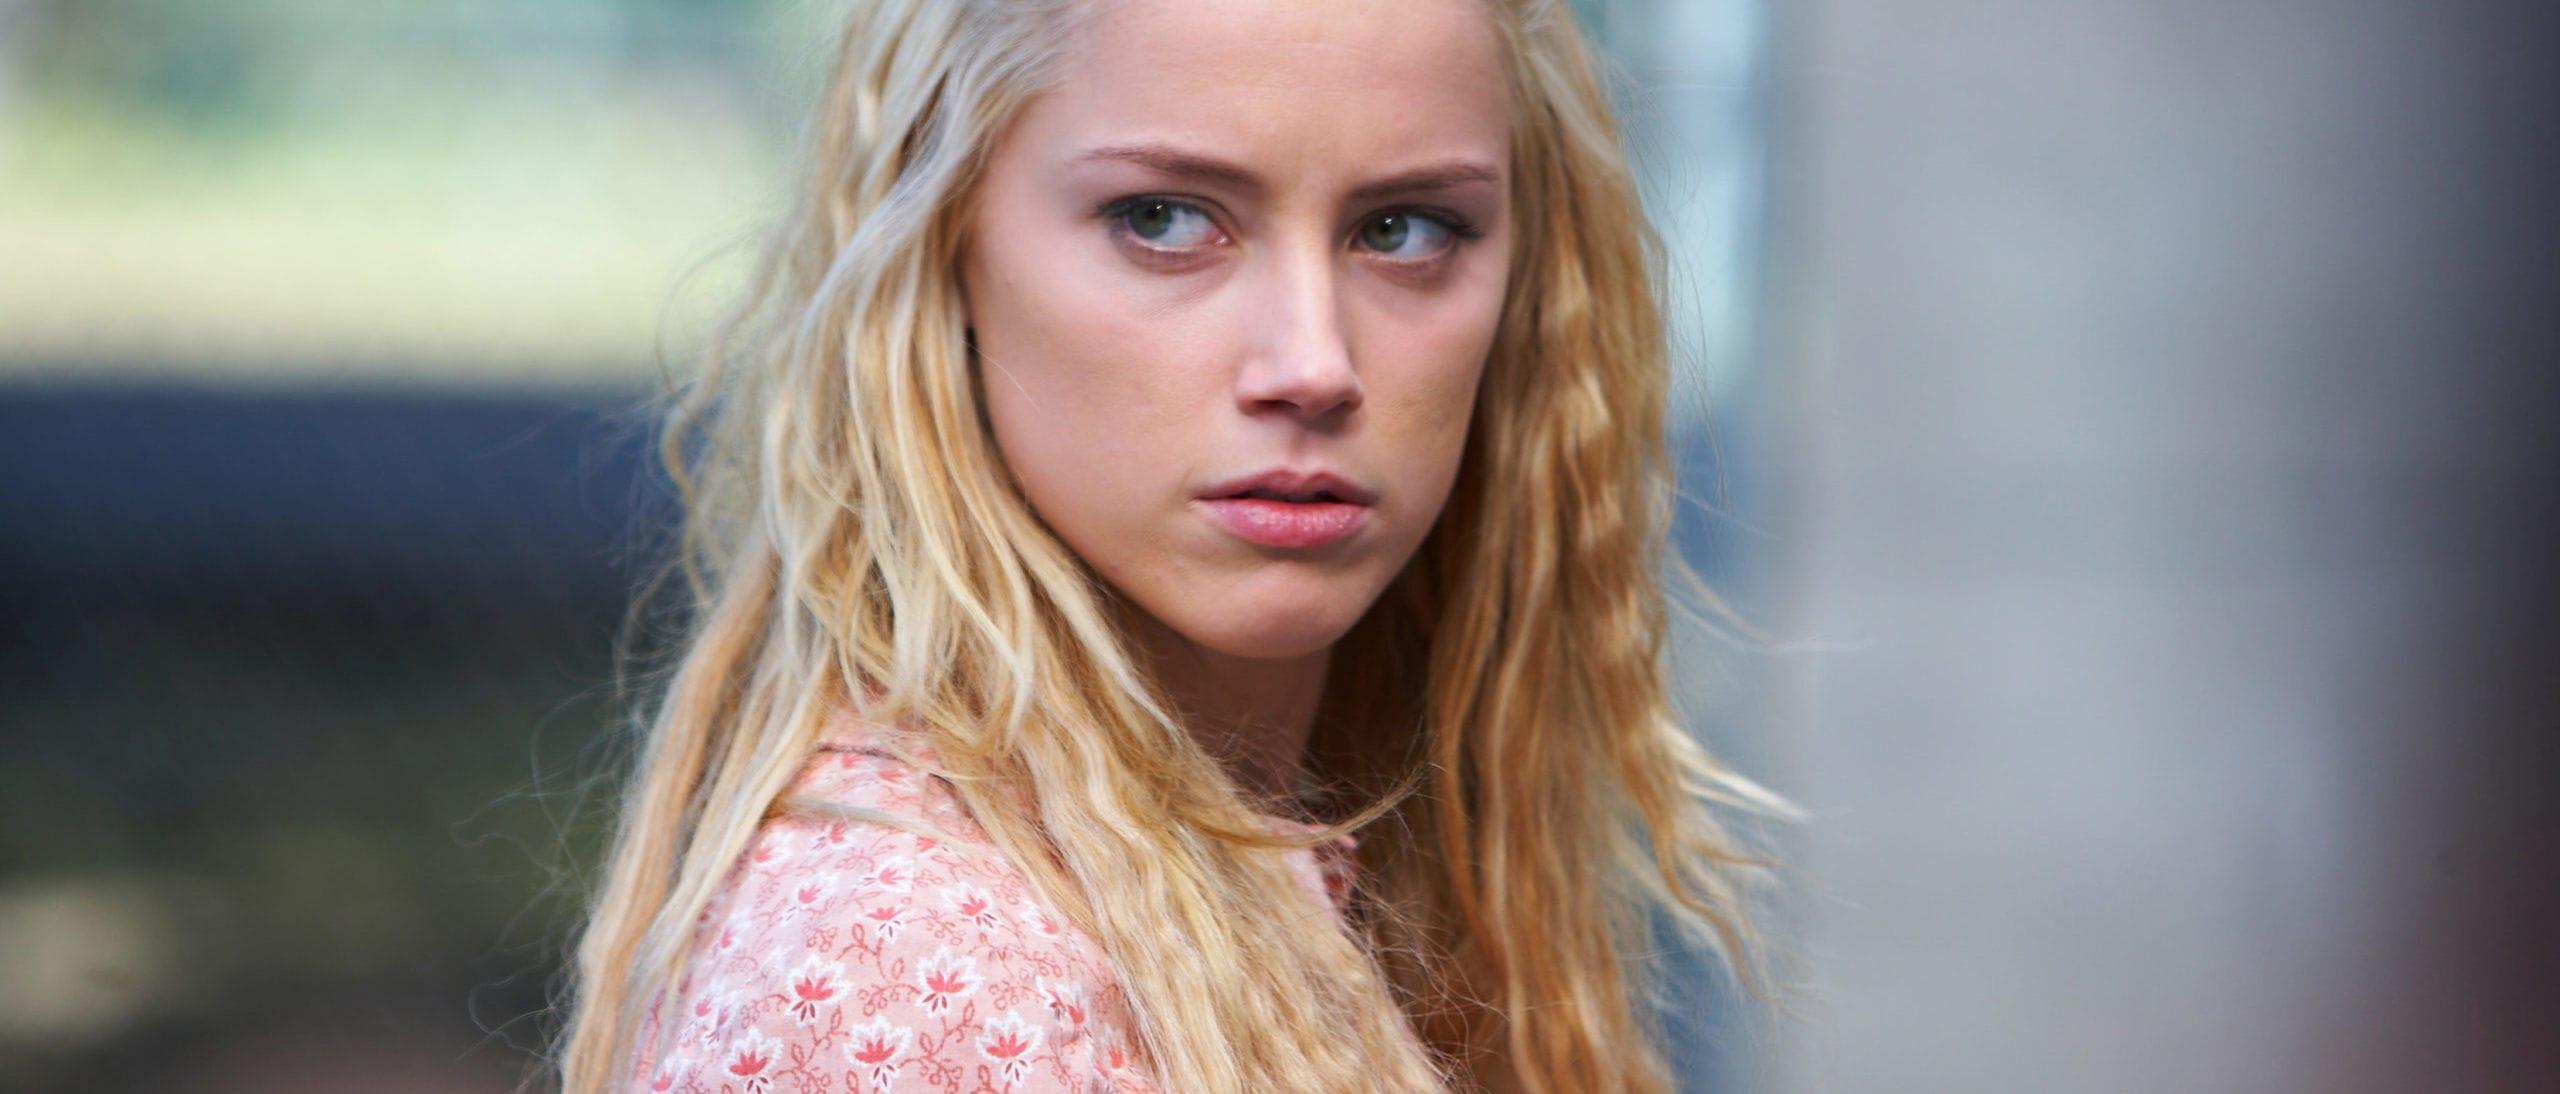 Amber Heard Aquaman 2 Netflix